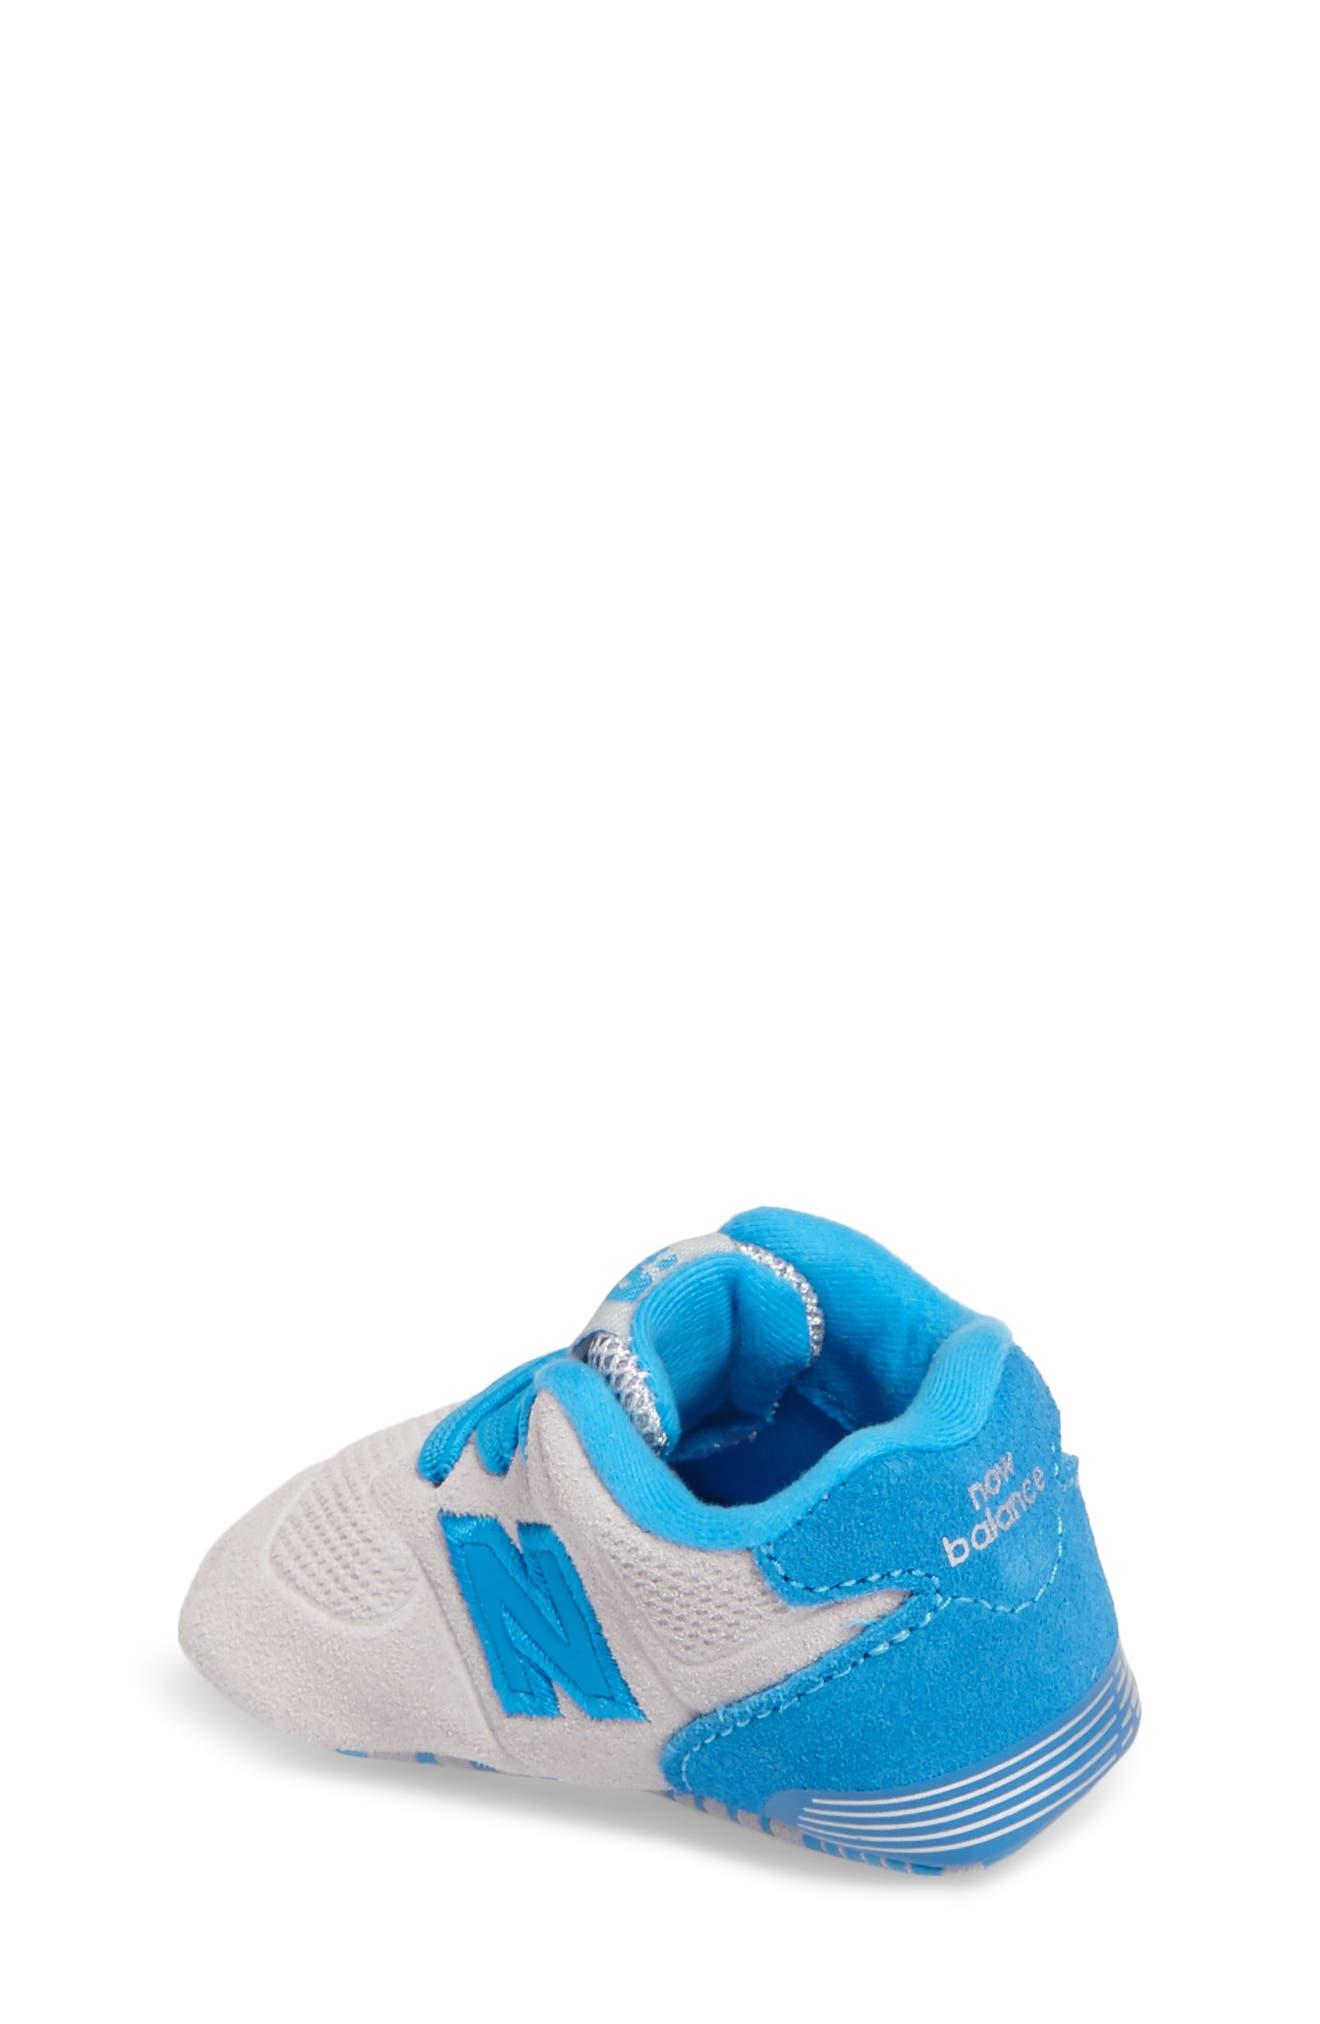 Alternate Image 2  - New Balance 547 Crib Shoe (Baby)